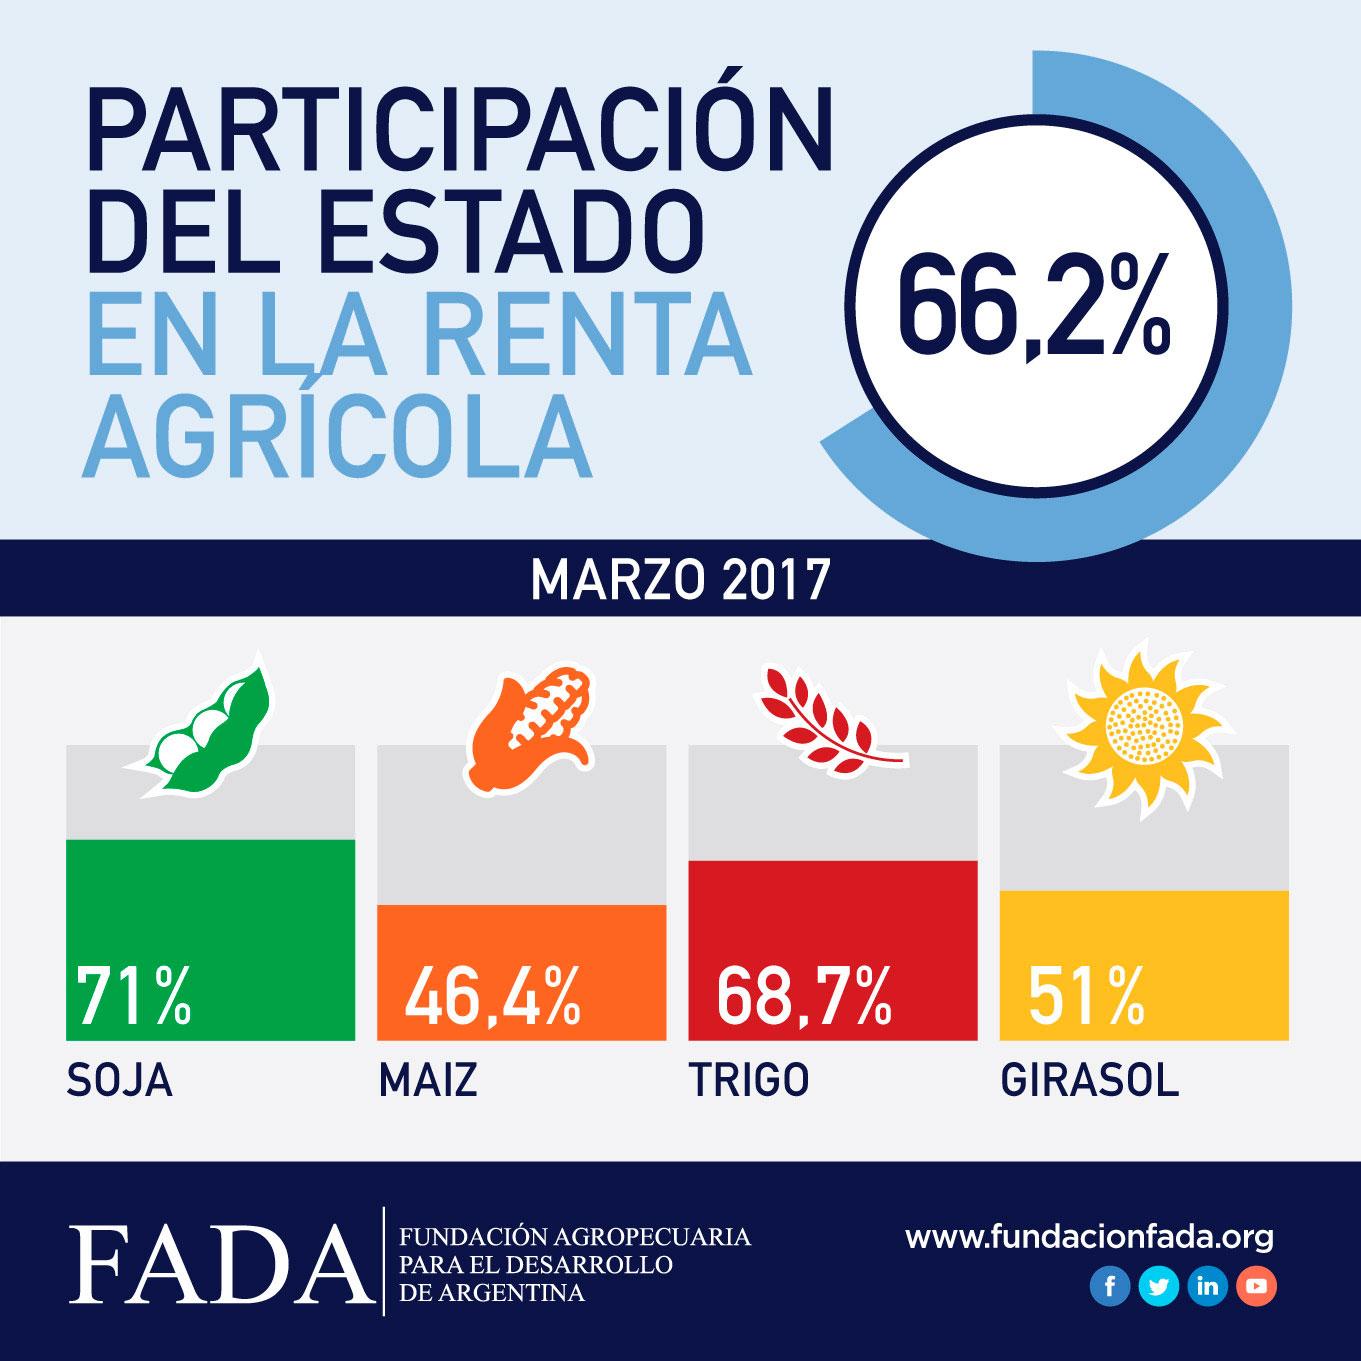 Índice FADA Marzo 2017: 66,2%